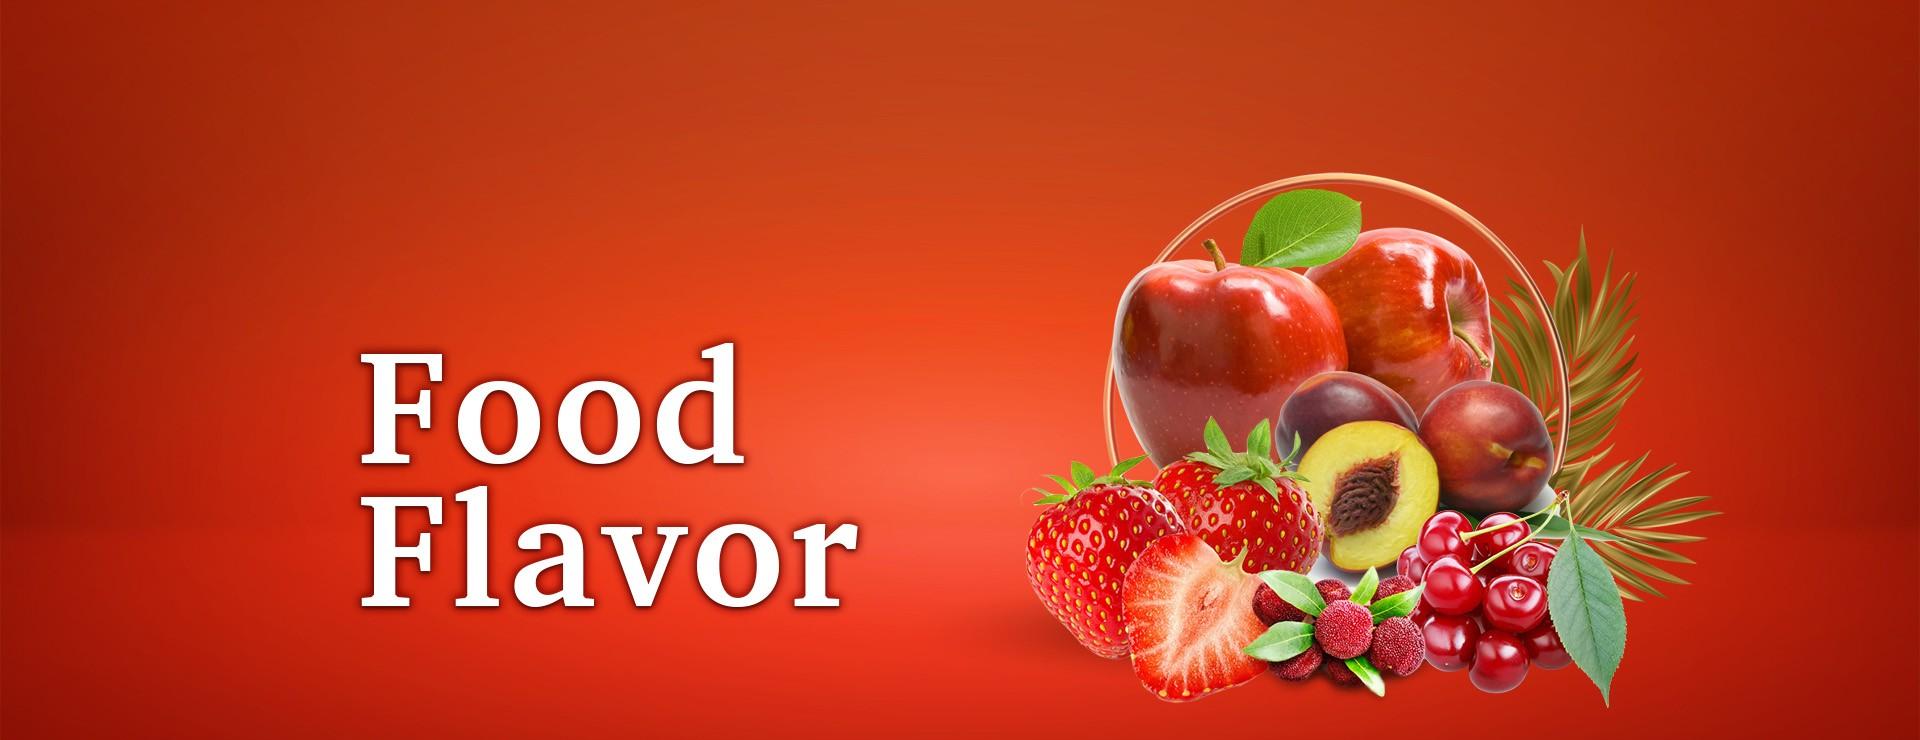 Food Flavor